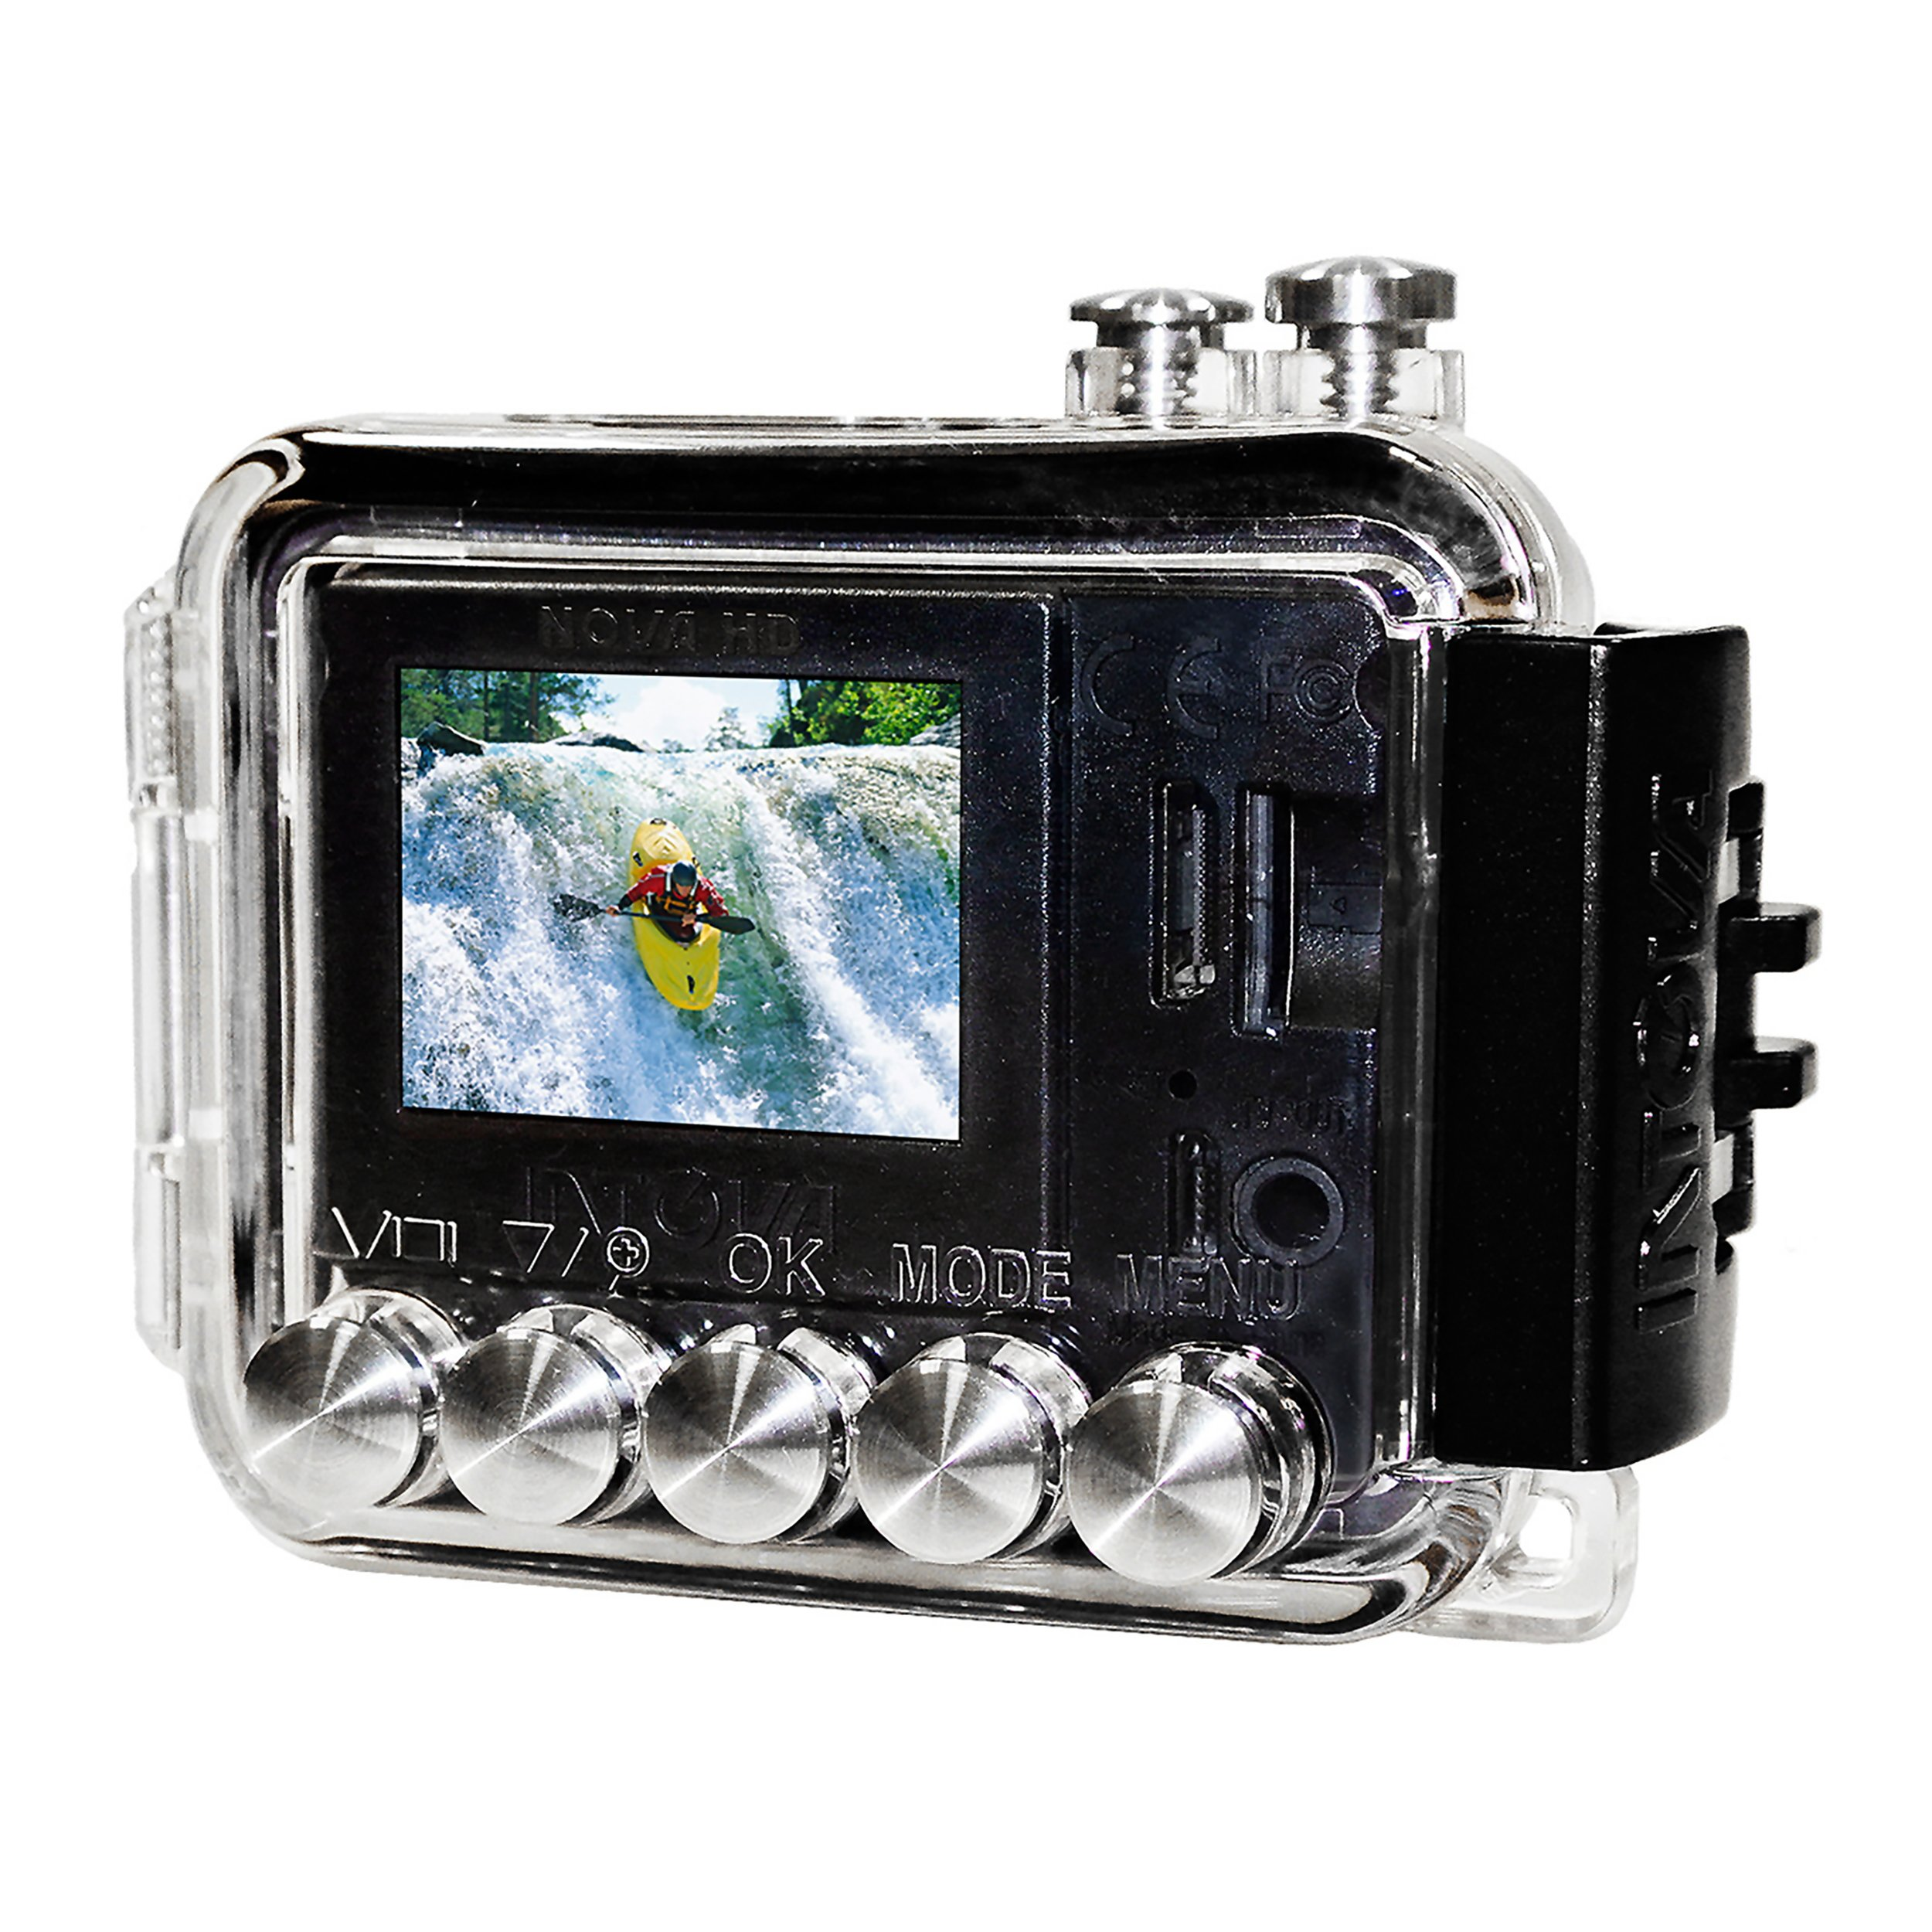 Intova Nova Floating Waterproof 1080p HD Video Camera by Intova (Image #2)